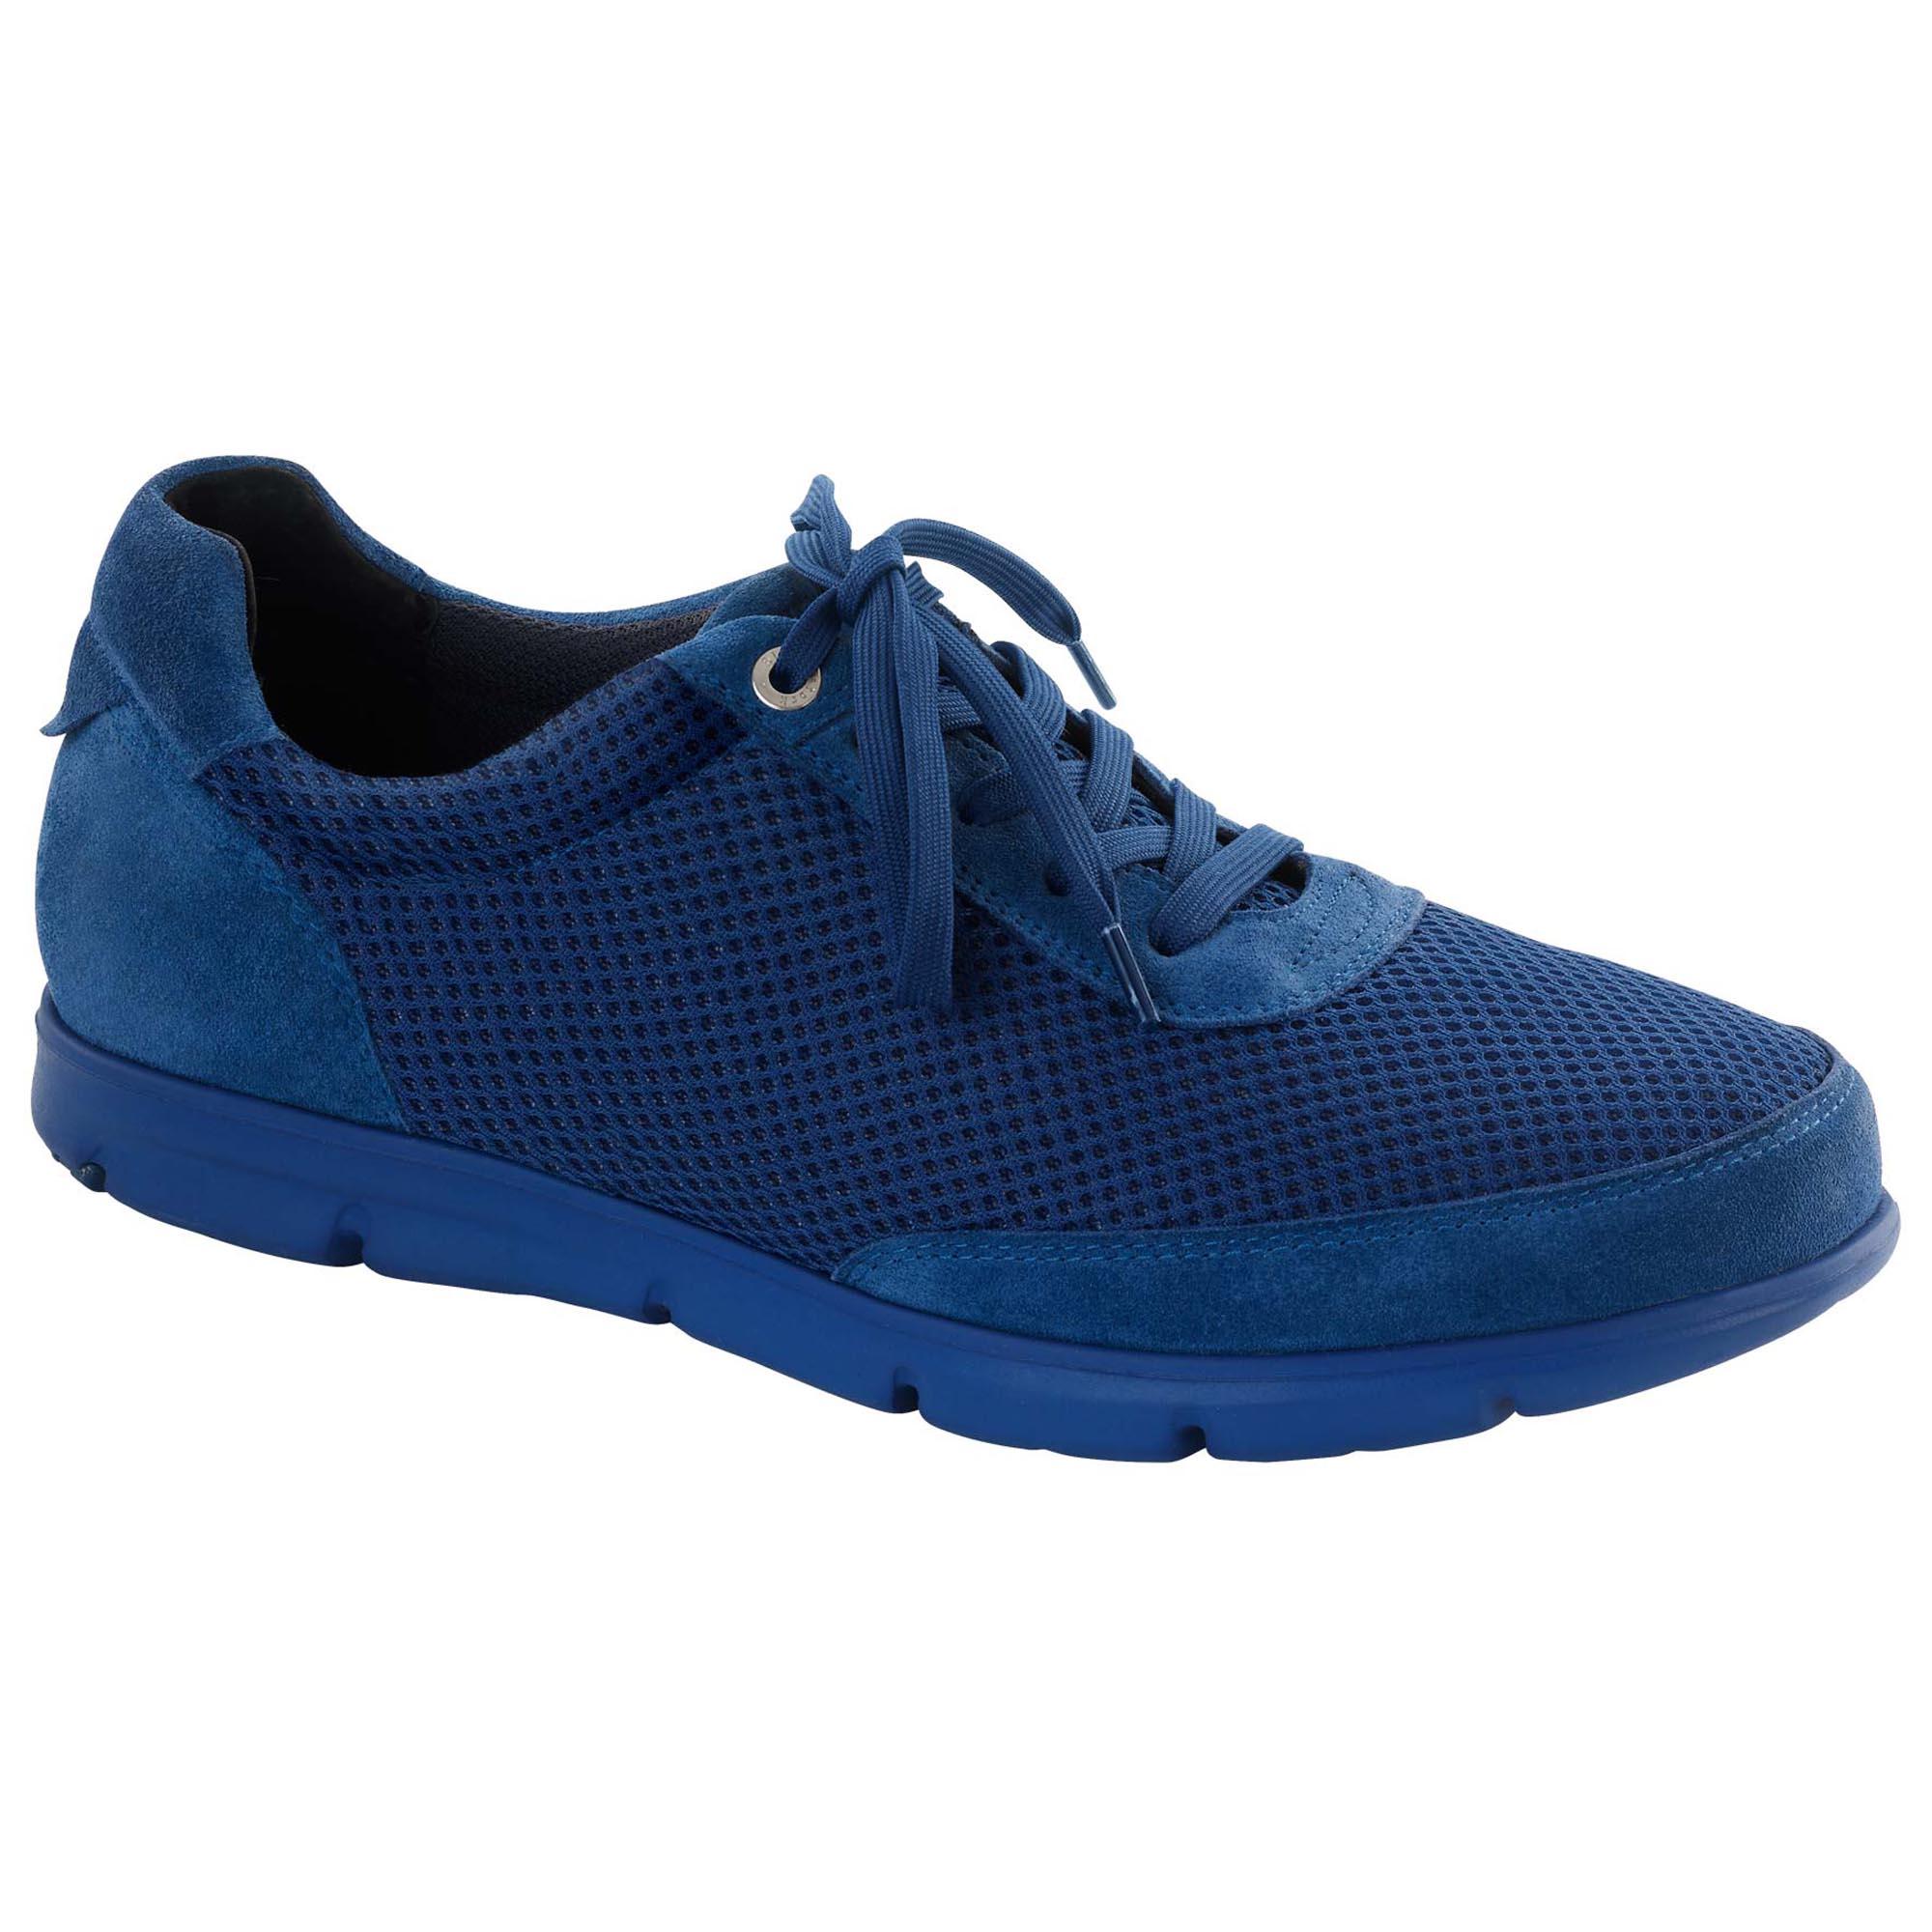 907841533013 Illinois Suede Leather Textile Royal Blue